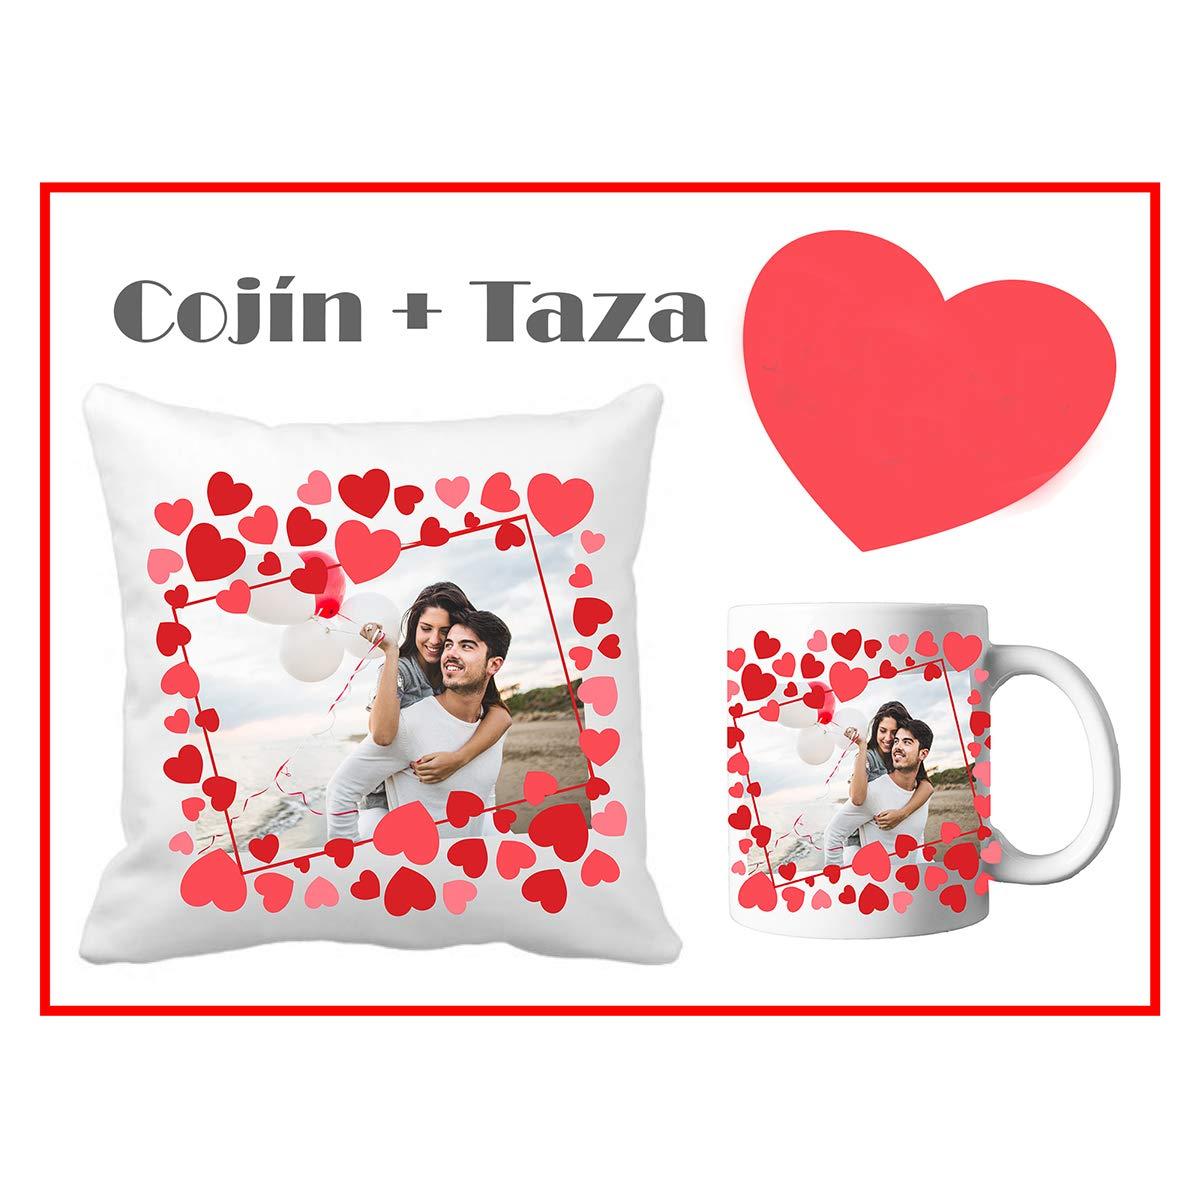 Regalo San Valentín/Cojín + Taza Personalizado con Foto ...